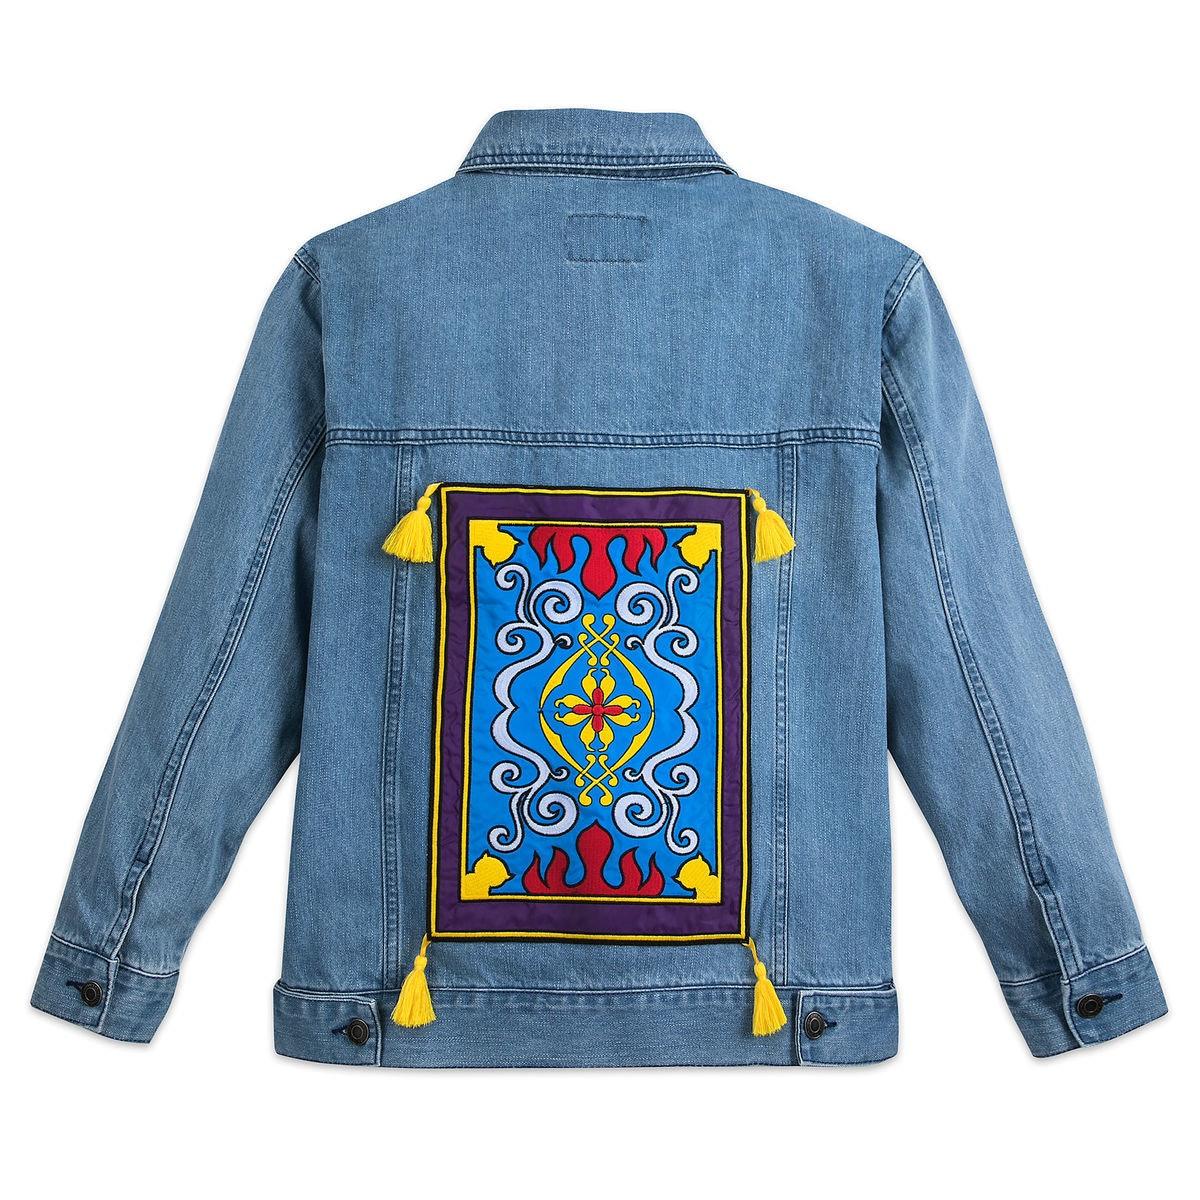 Aladdin Denim Jacket - Oh My Disney